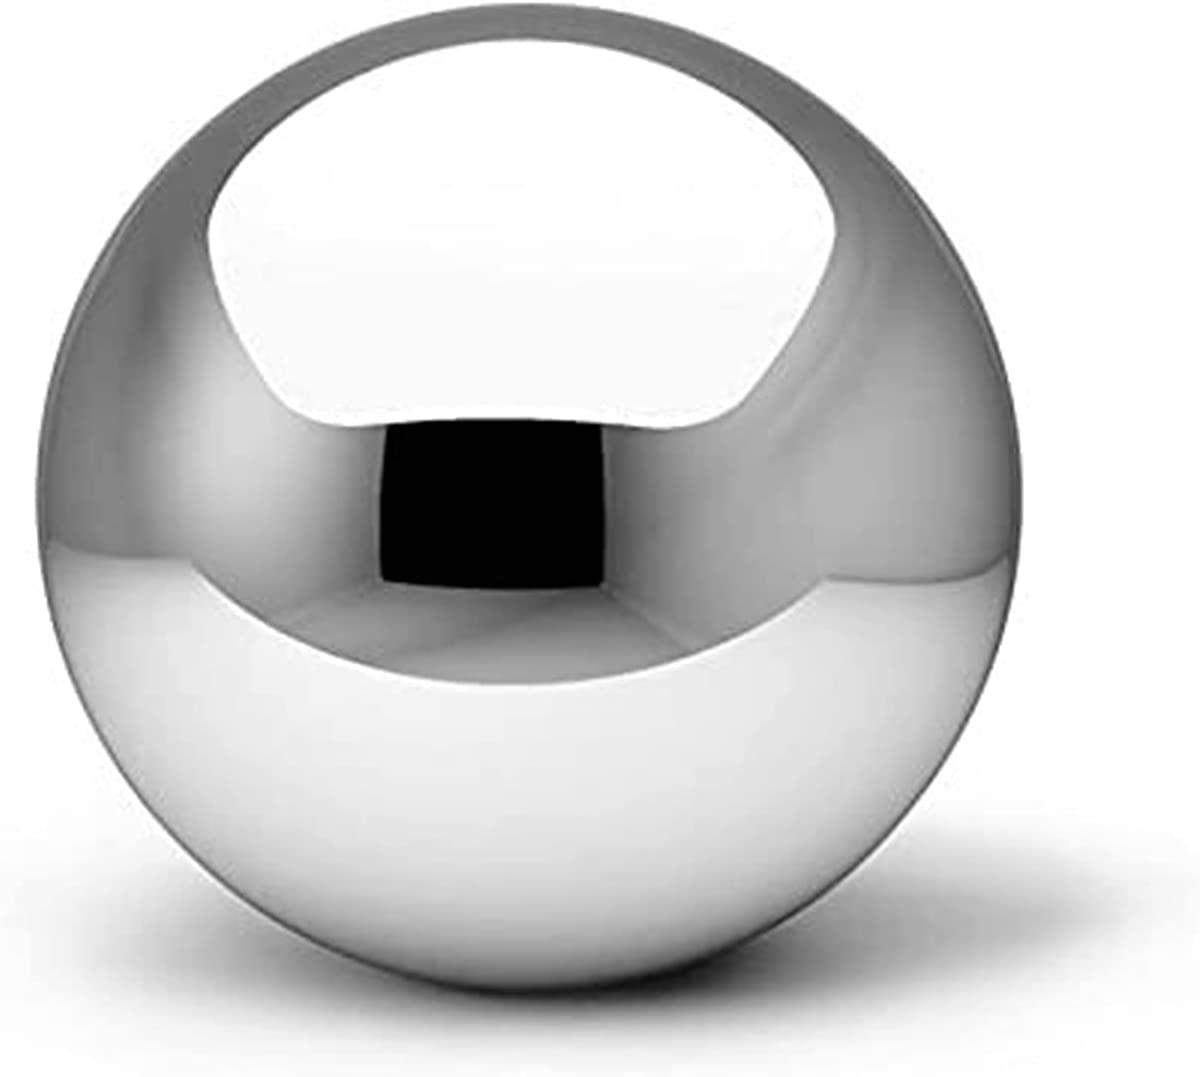 A&A Decor Gazing Balls for Gardens Hollow Ball Stainless Steel Gazing Ball Garden Balls Ornaments Seamless Mirror Ball Floating Pond Balls for Home Garden Ornament Decorations (Size : 12cm)